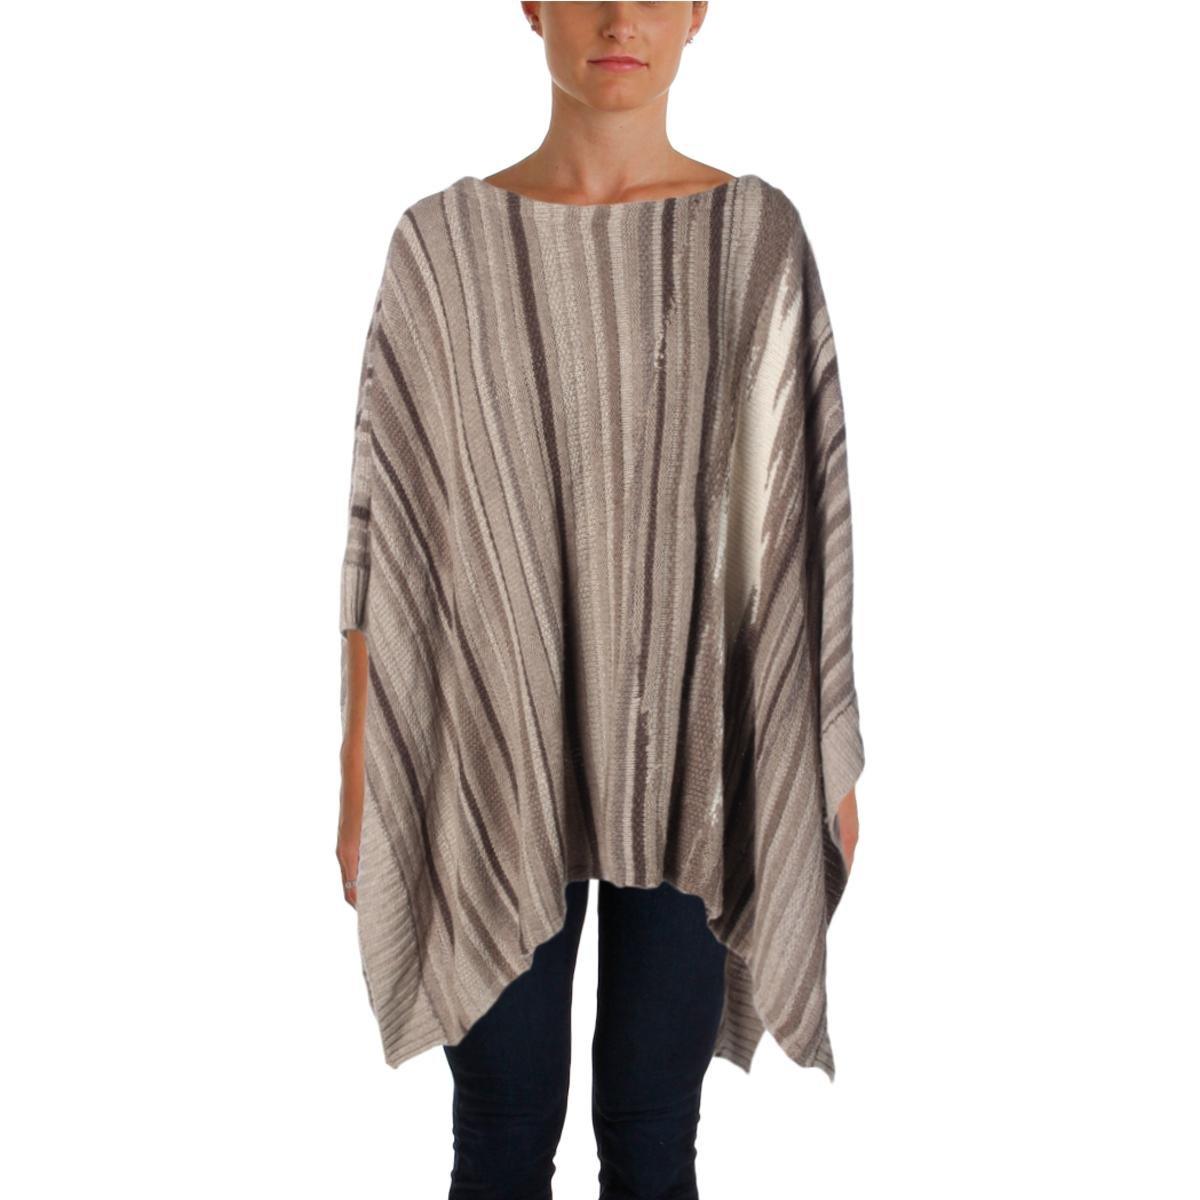 Lauren Ralph Lauren Womens Wool Blend Striped Poncho Sweater Taupe O/S